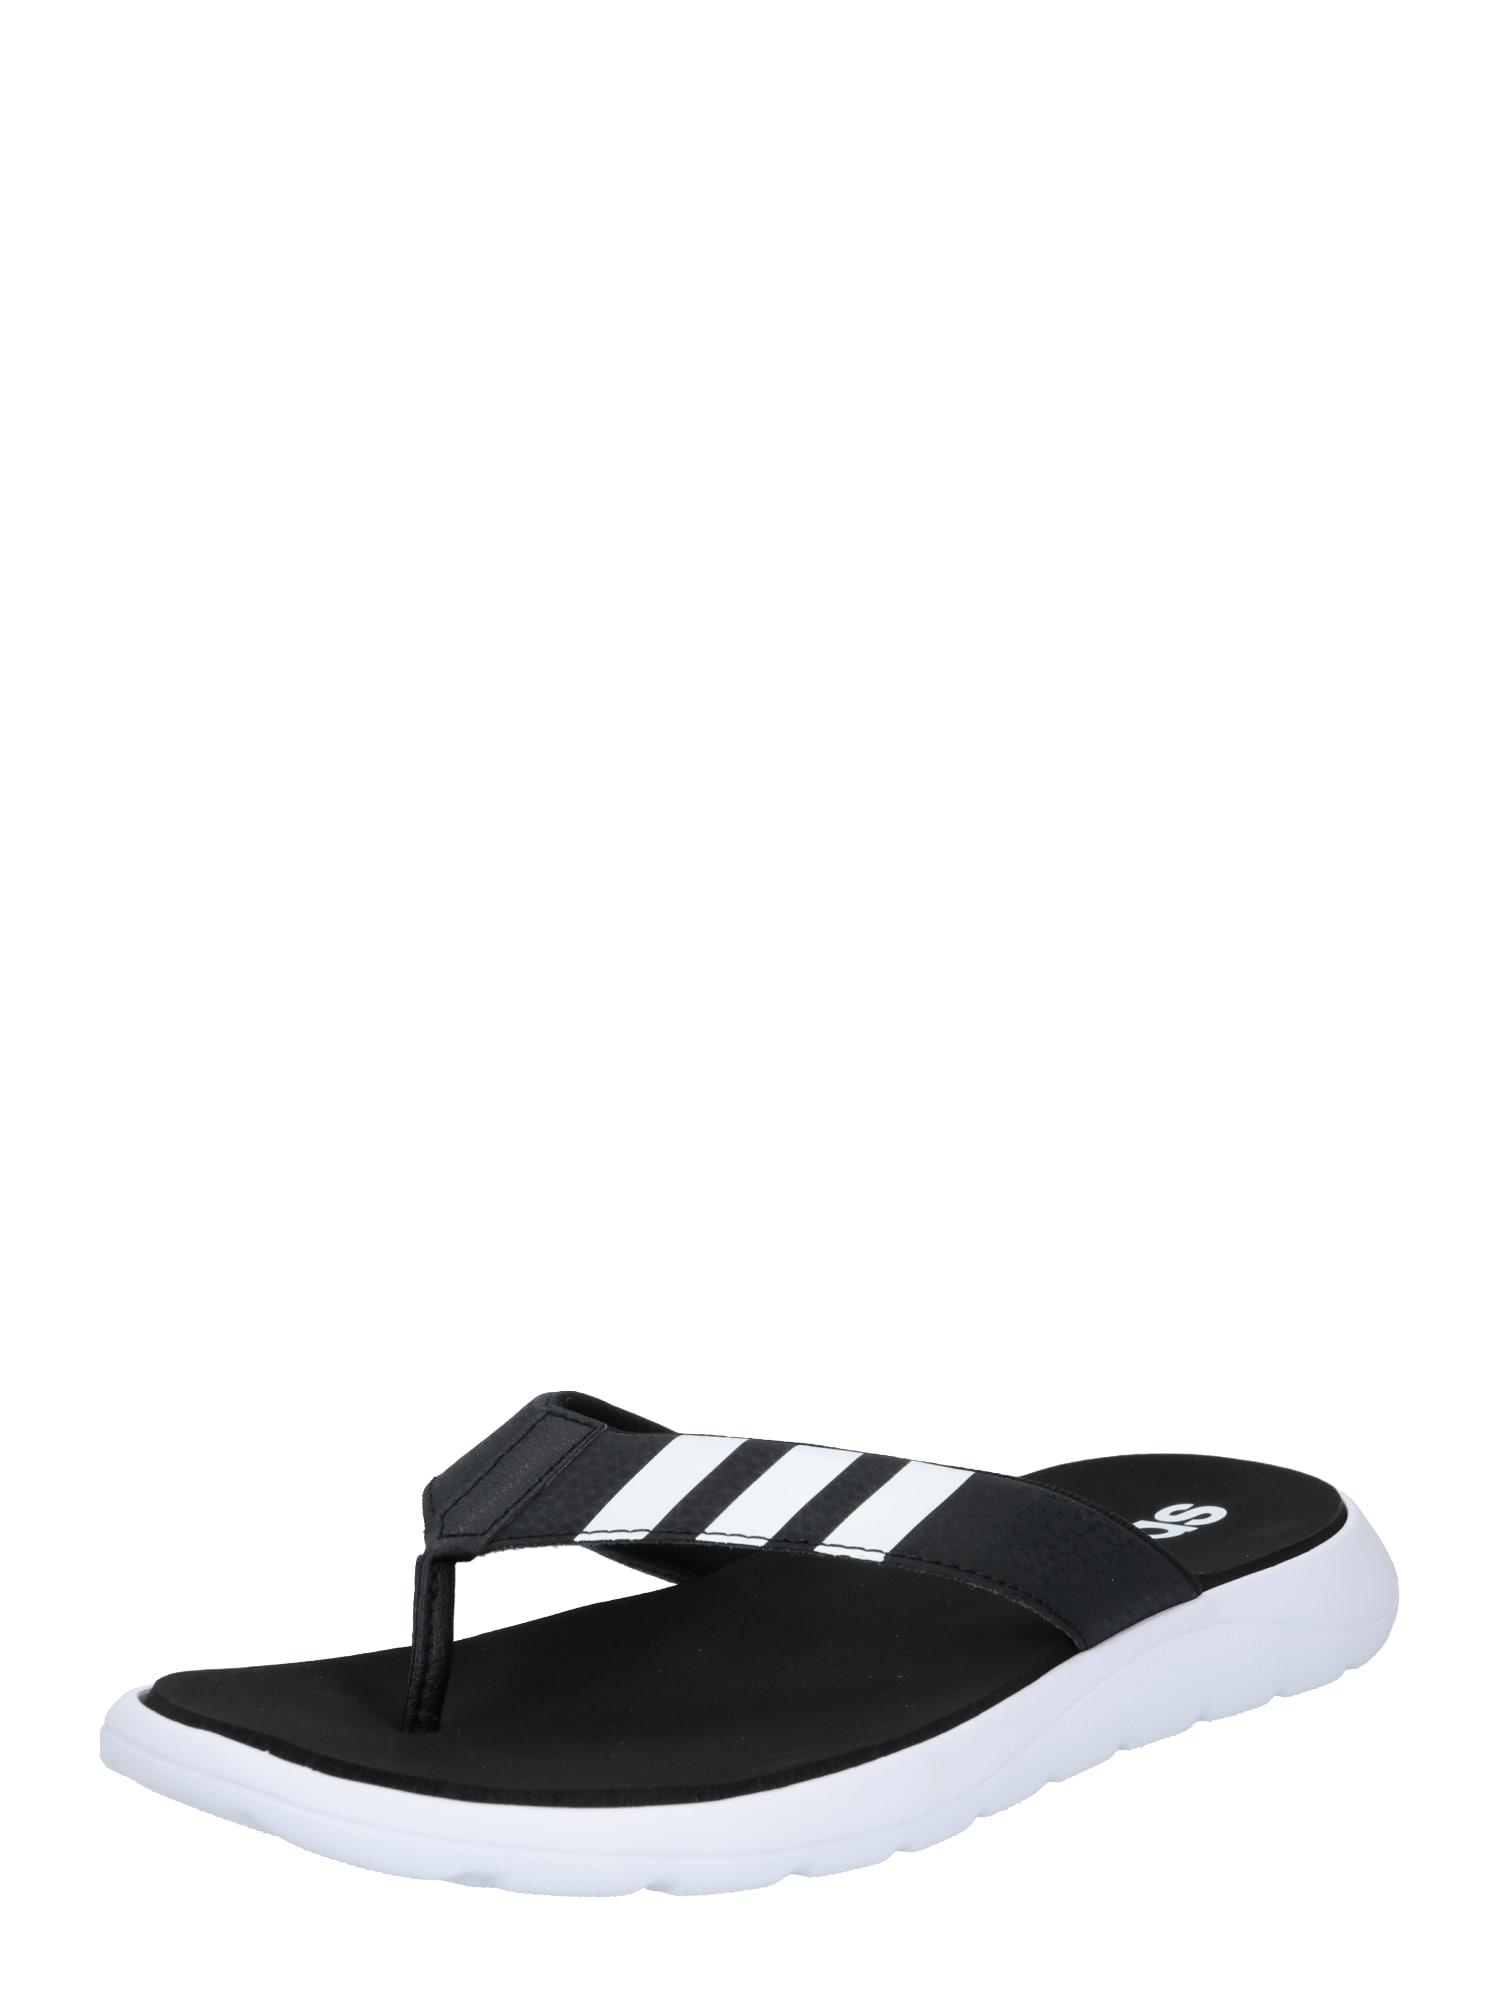 ADIDAS PERFORMANCE Sandalai / maudymosi batai juoda / balta